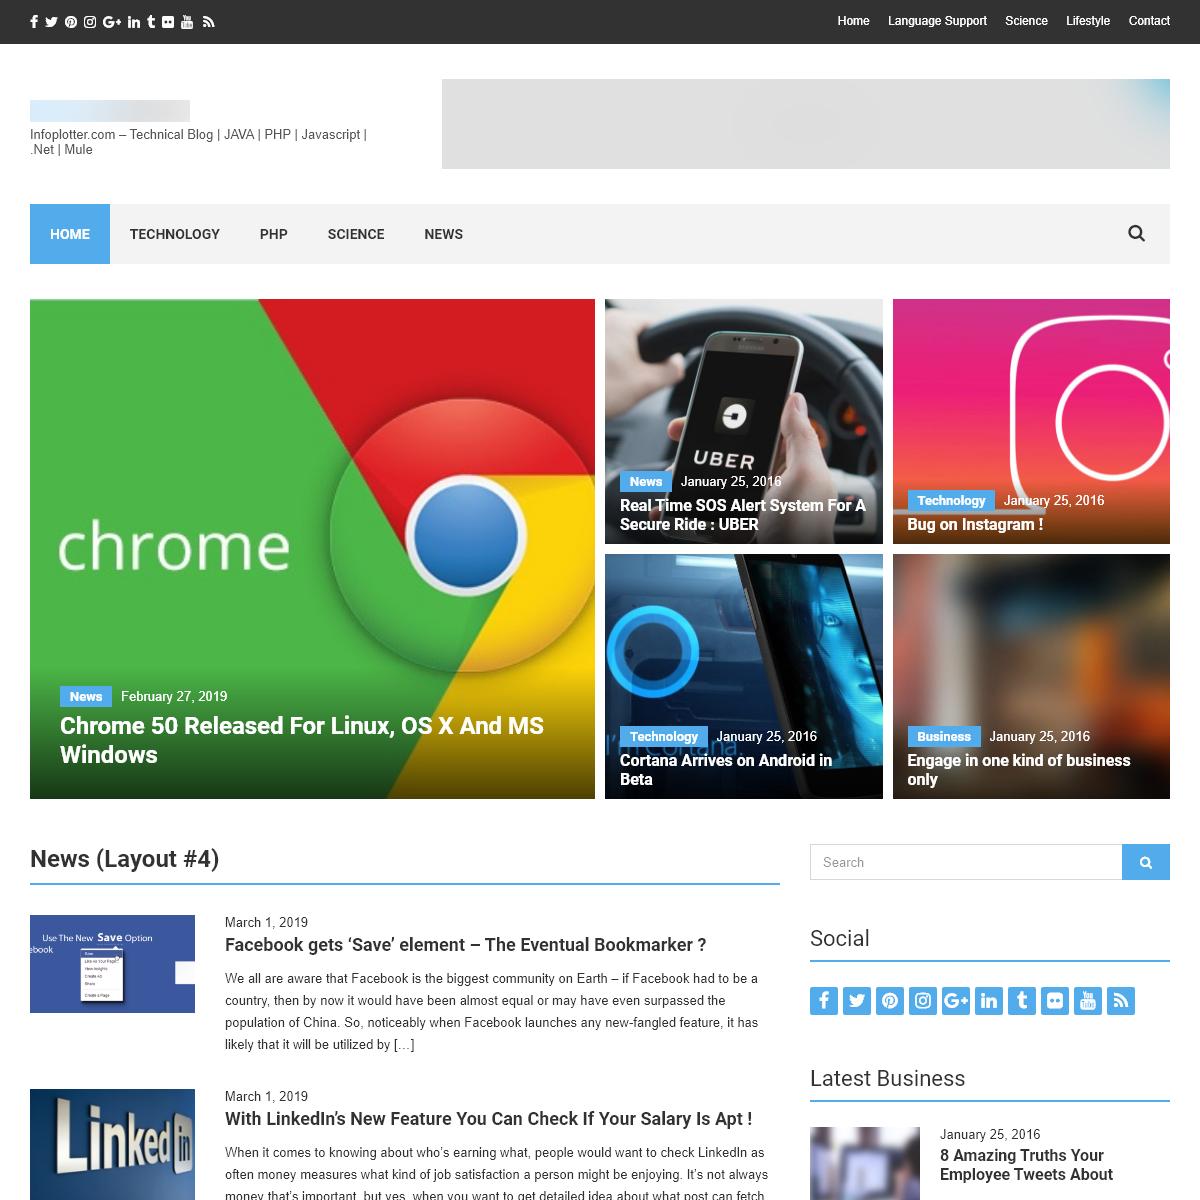 Infoplotter – Infoplotter.com – Technical Blog - JAVA - PHP - Javascript - .Net - Mule